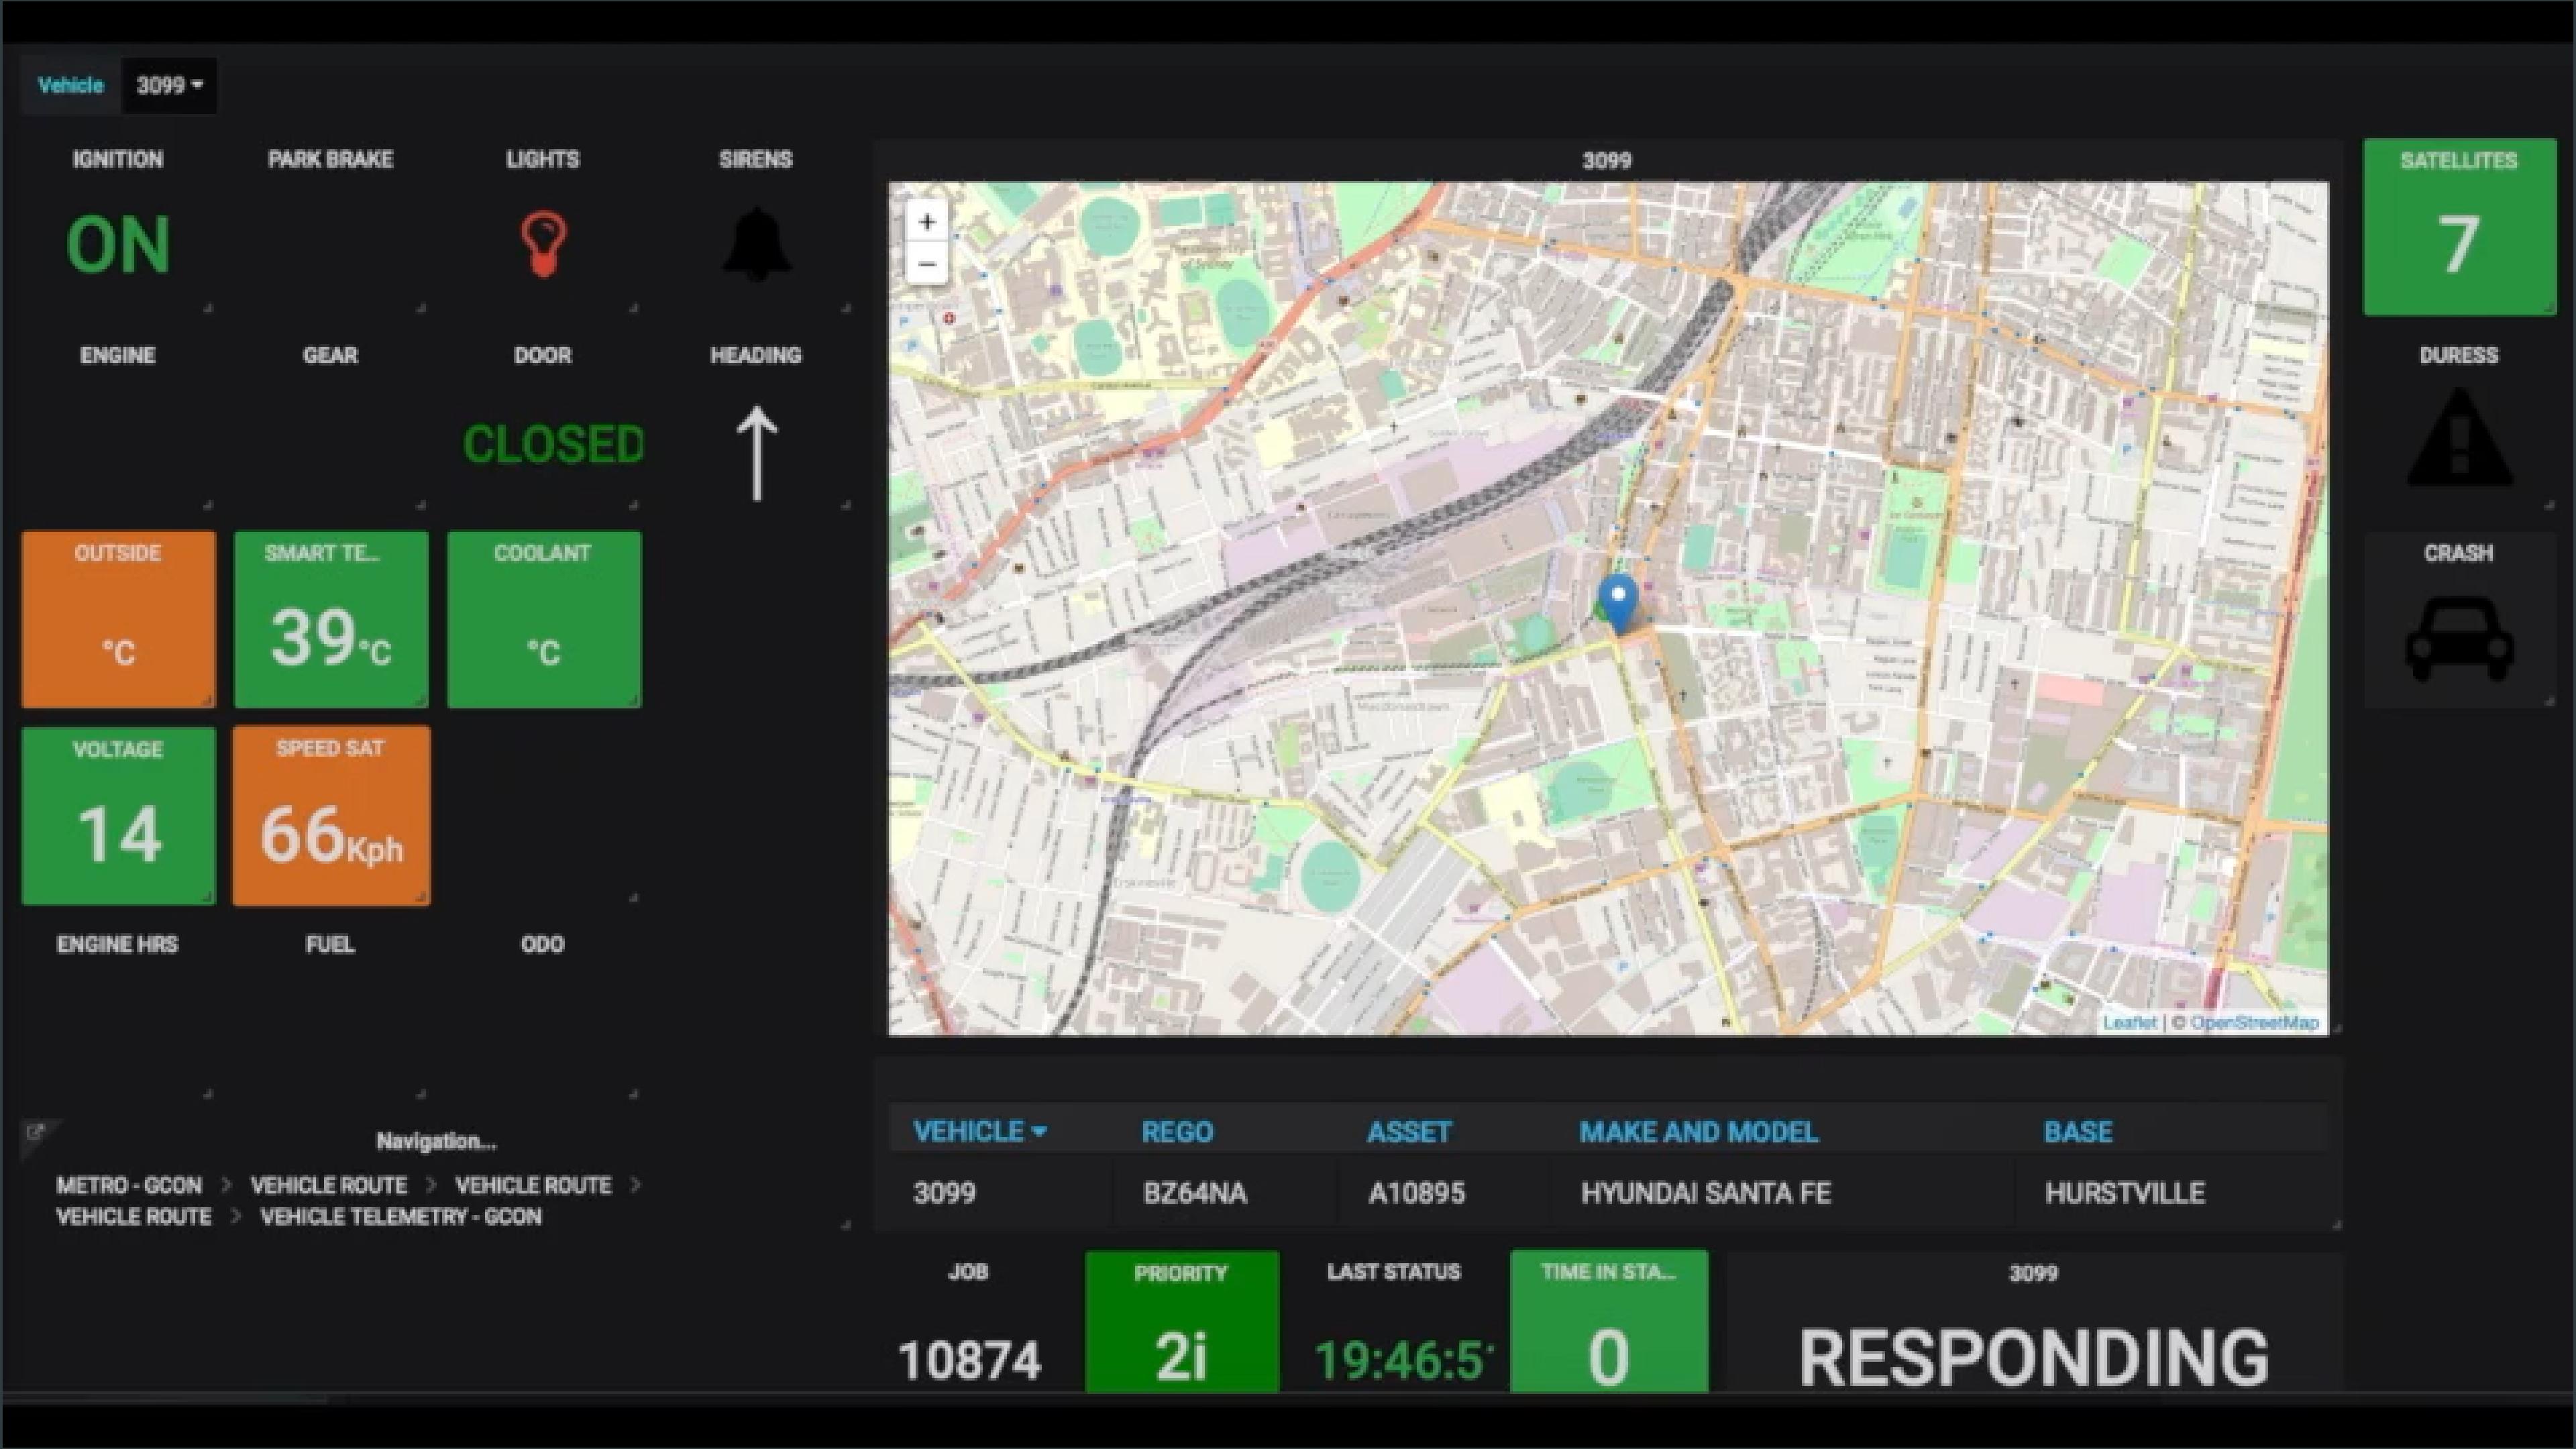 EMS Vehicle Tracker